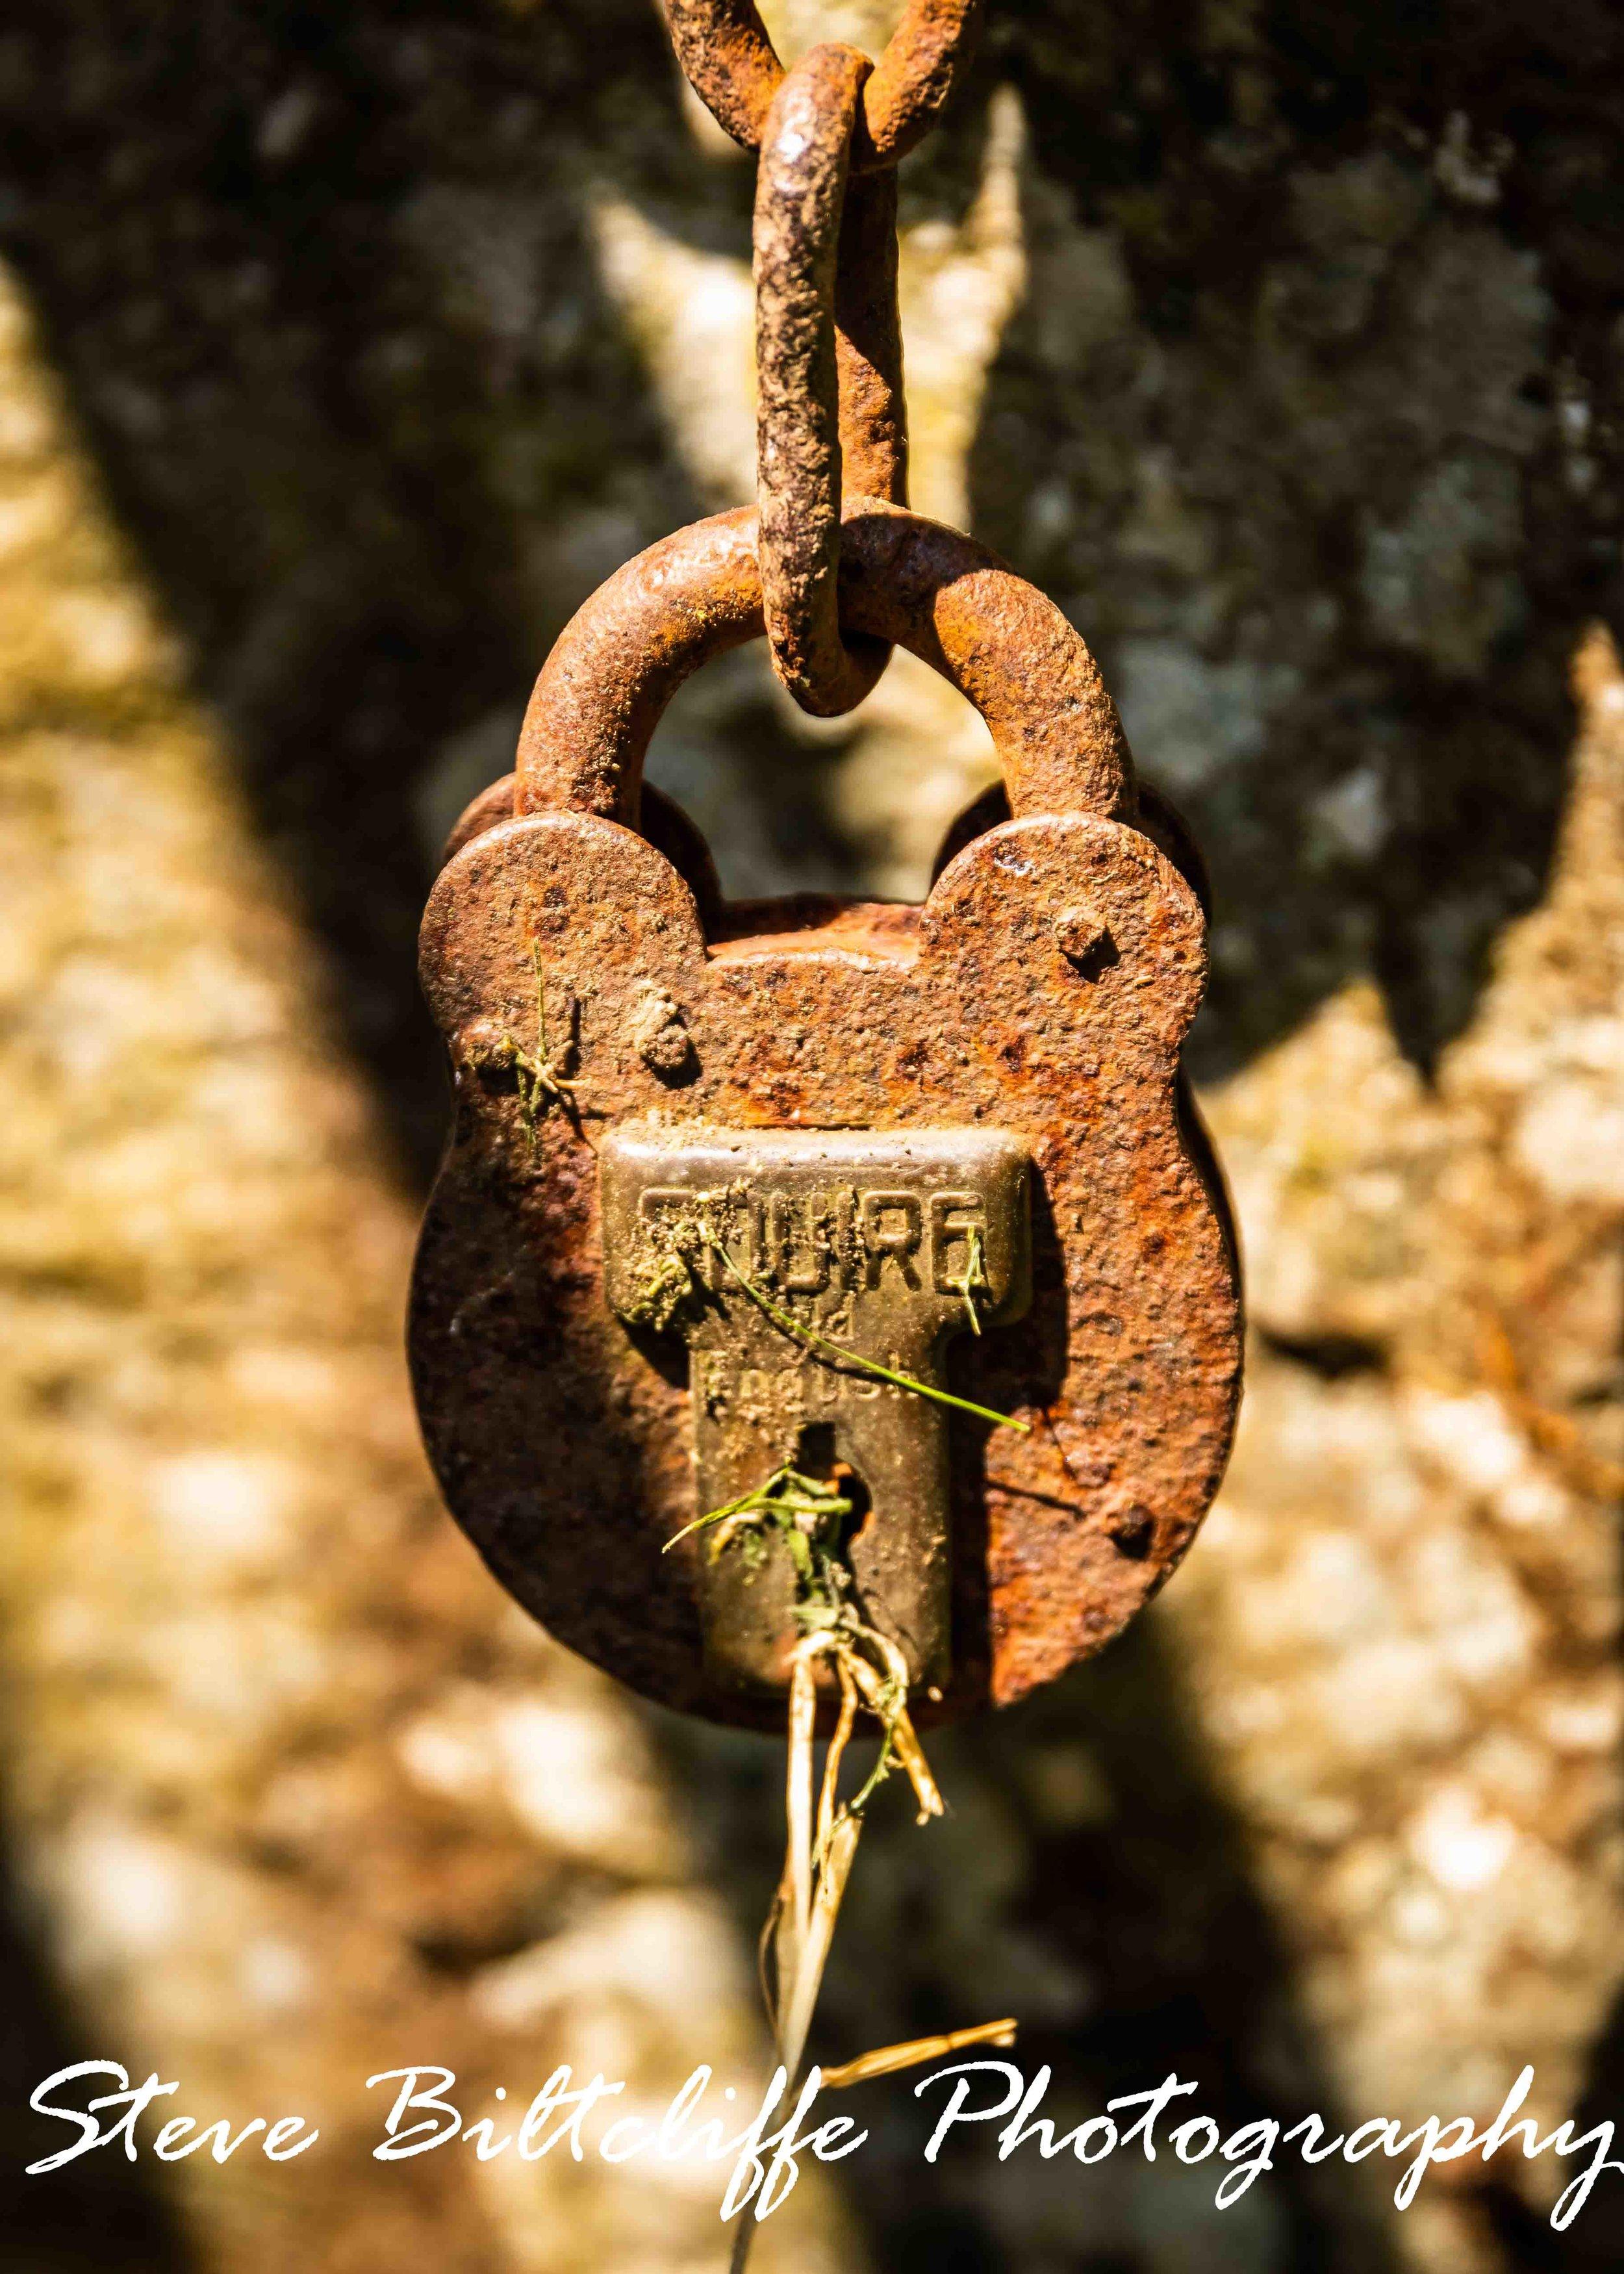 Missing Key